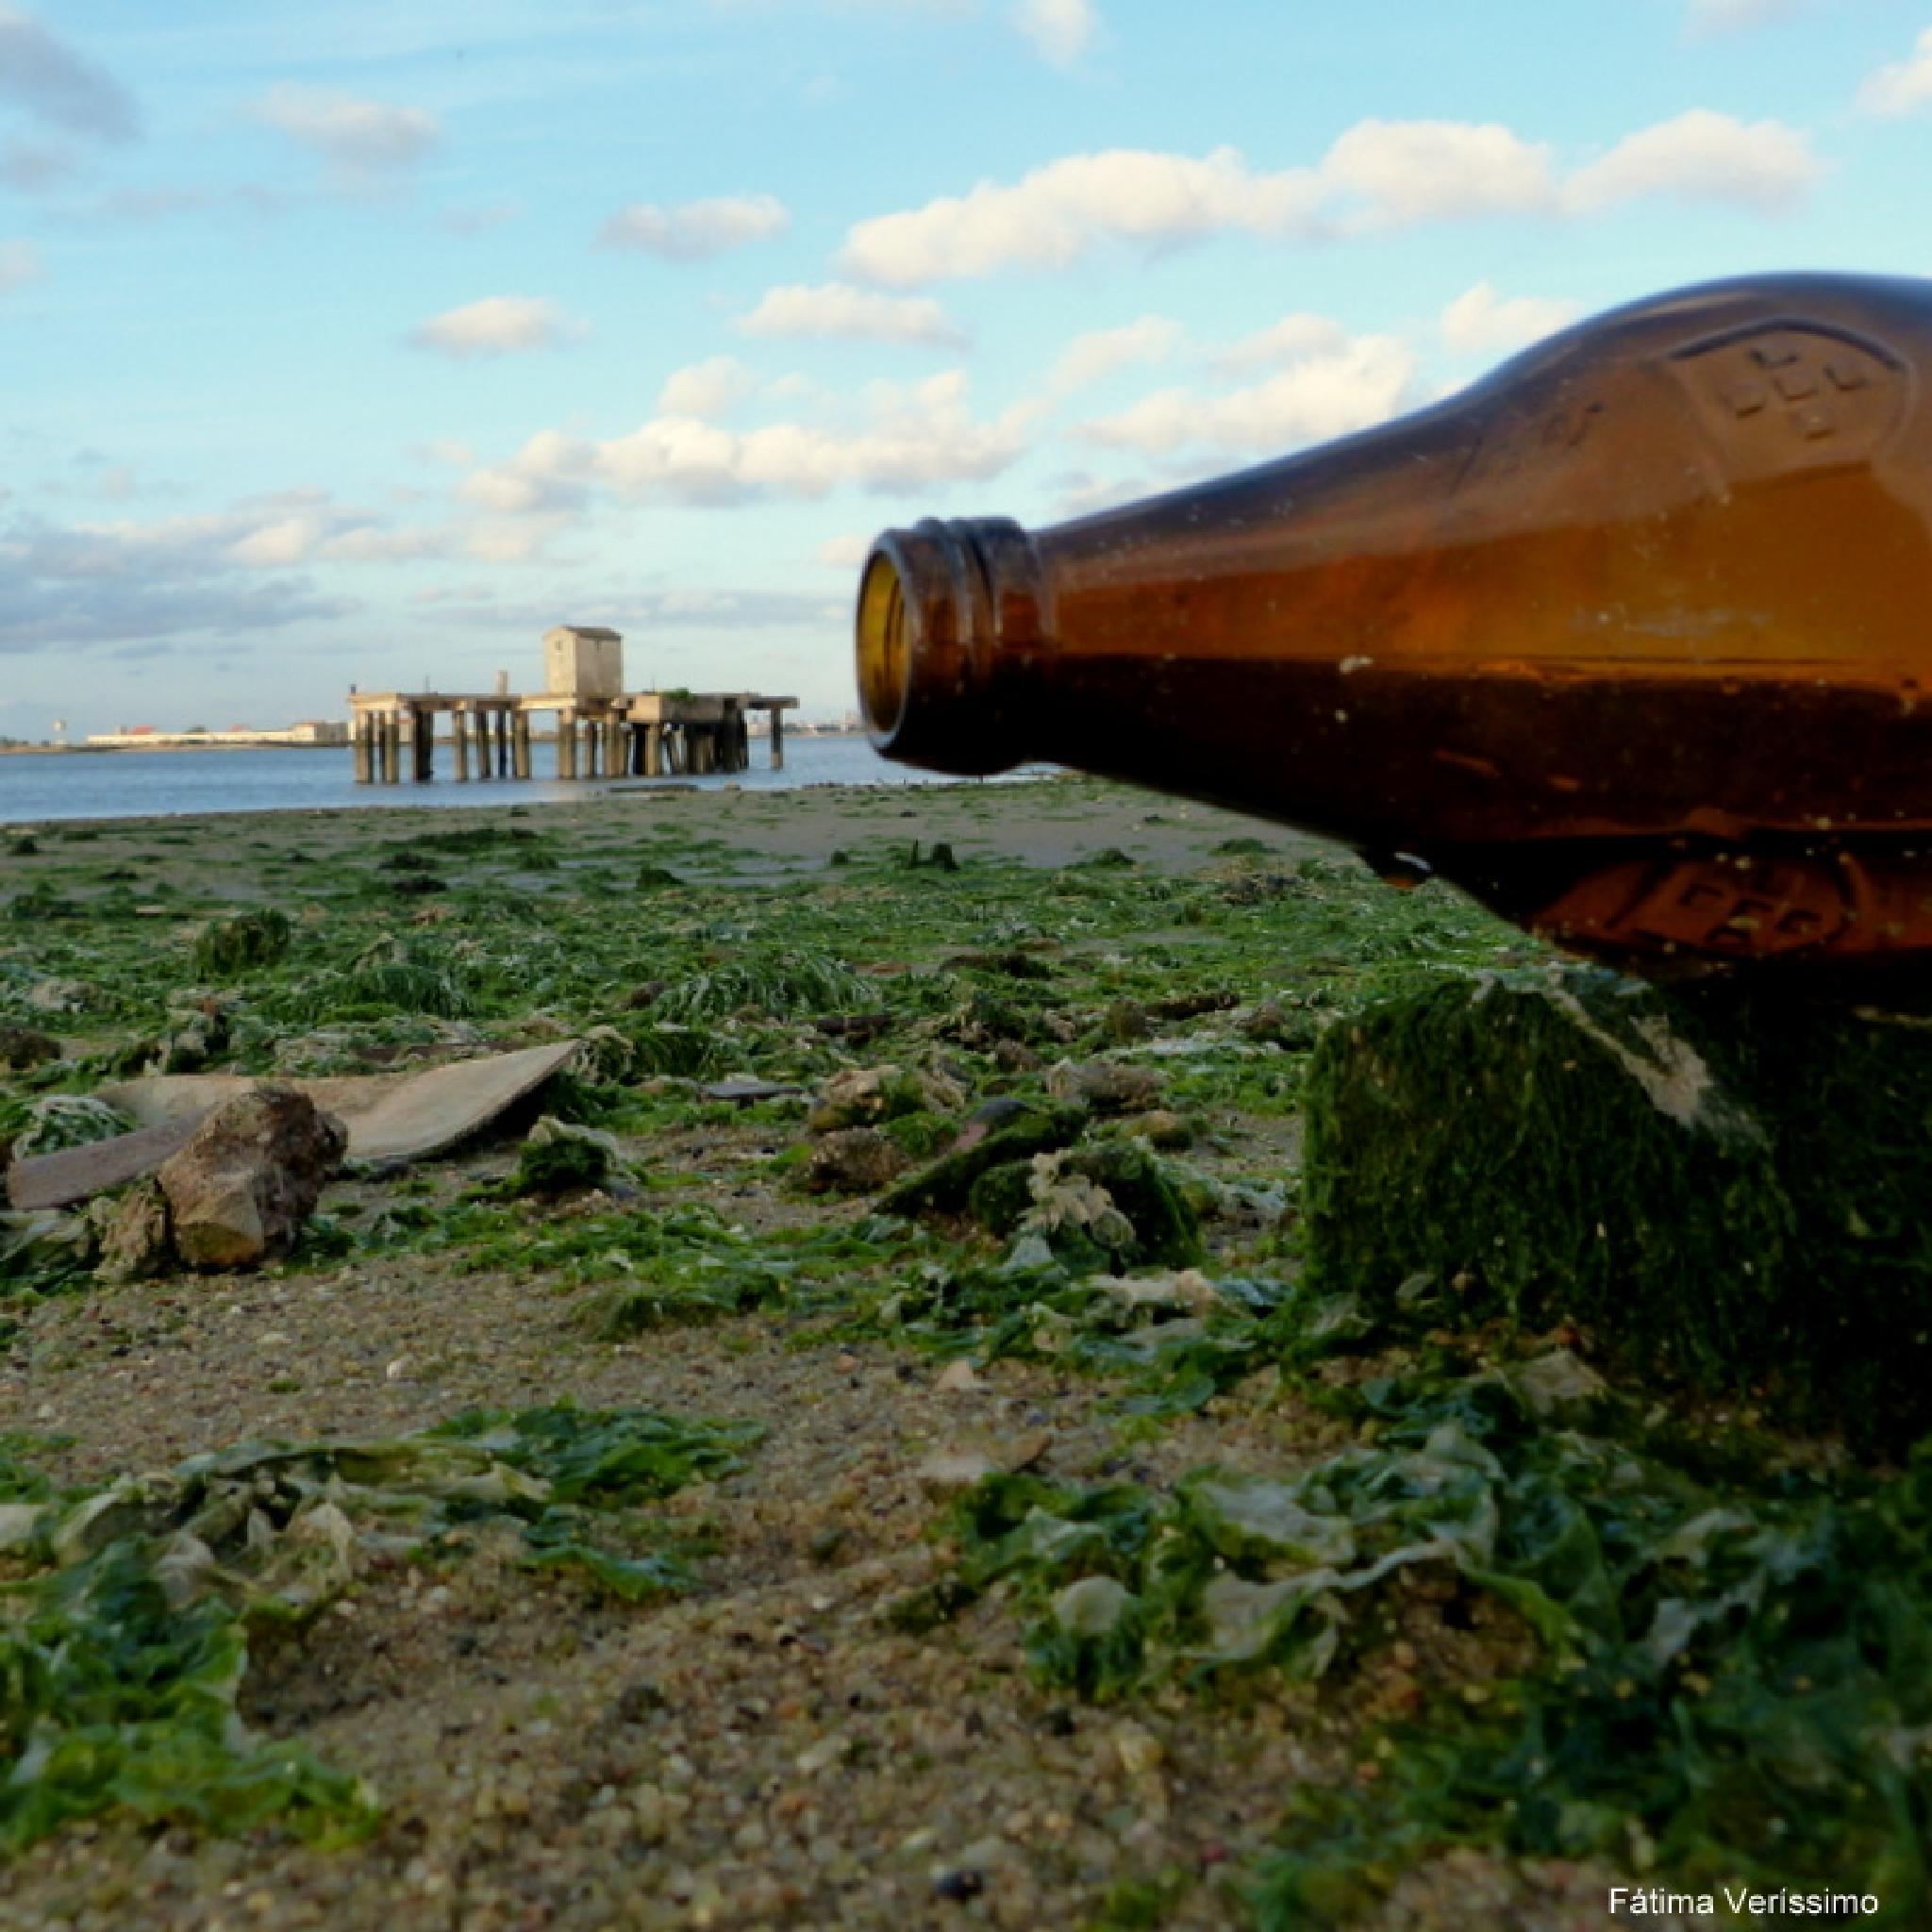 Landscape in a bottle by fatimaverissimo31